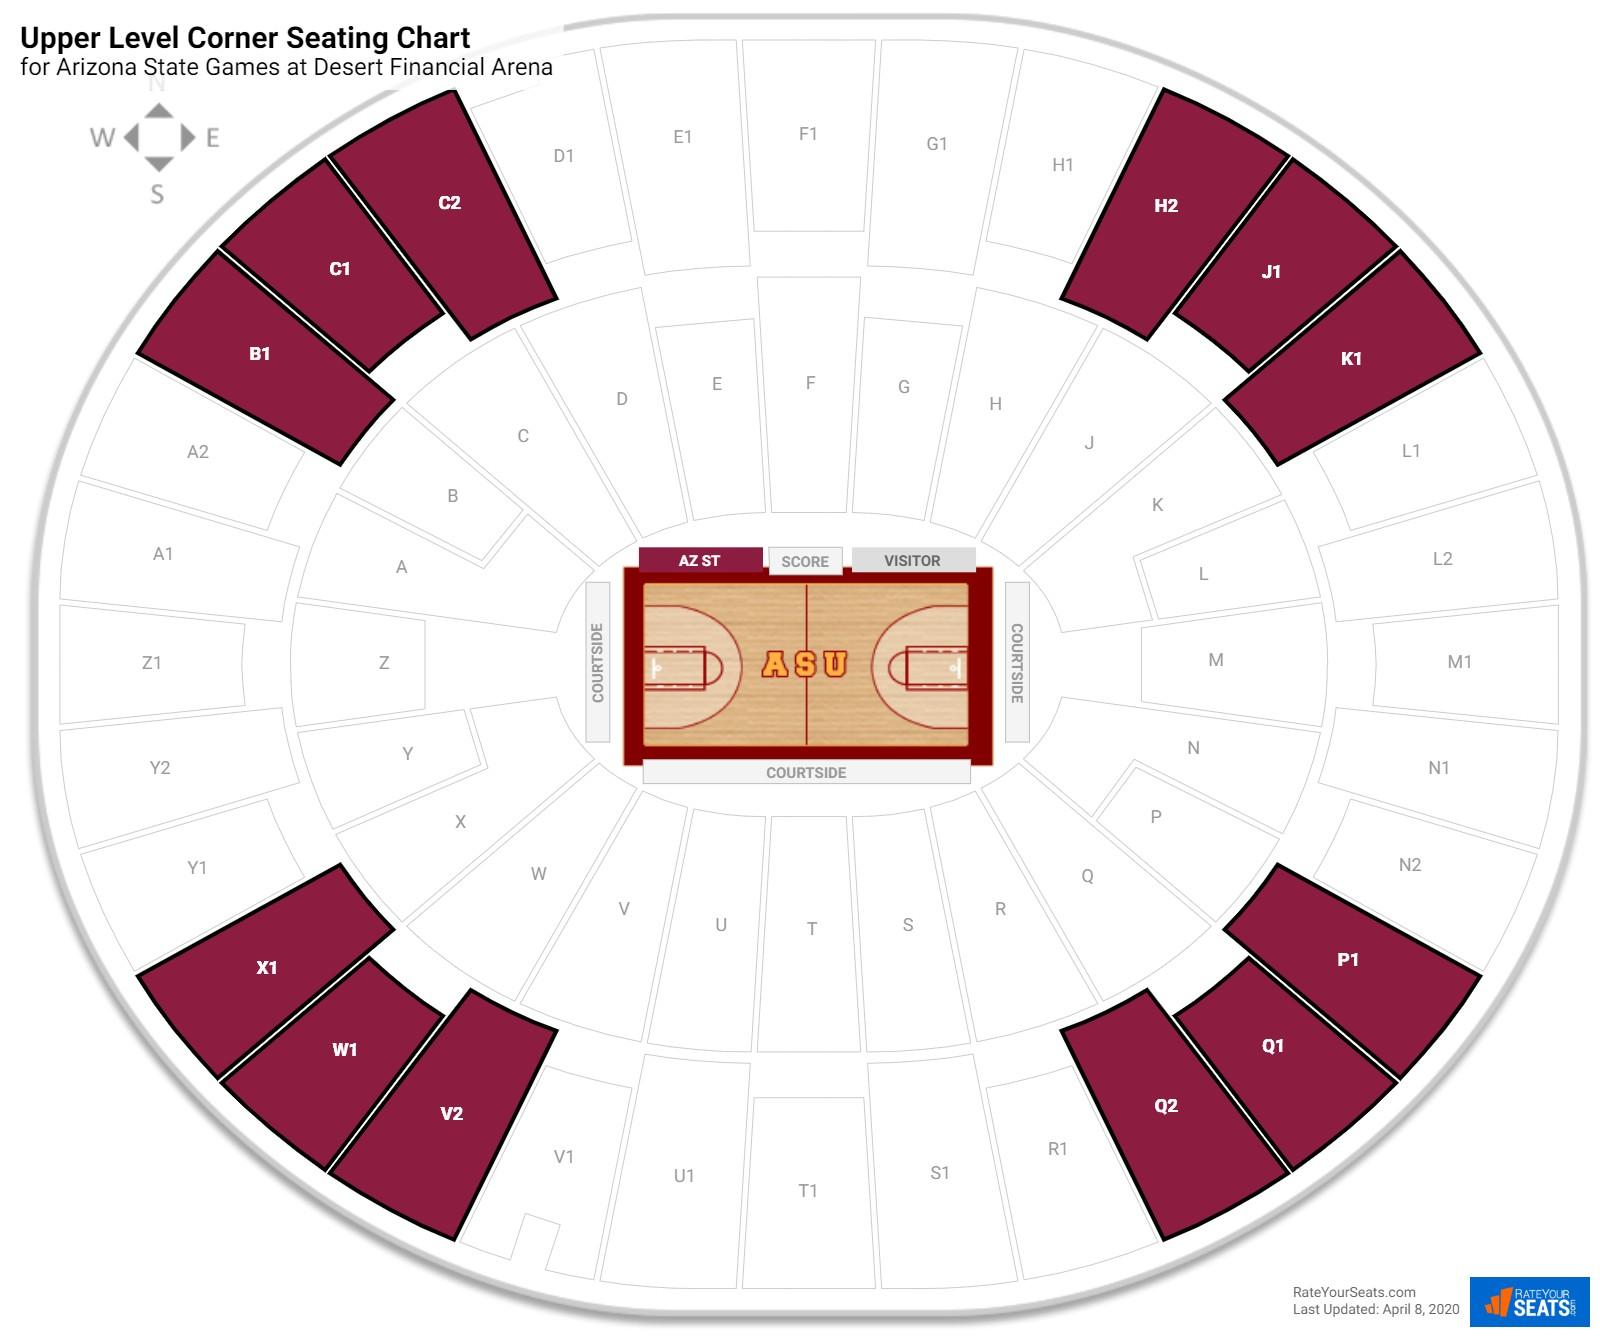 Wells Fargo Arena Upper Level Corner Seating Chart